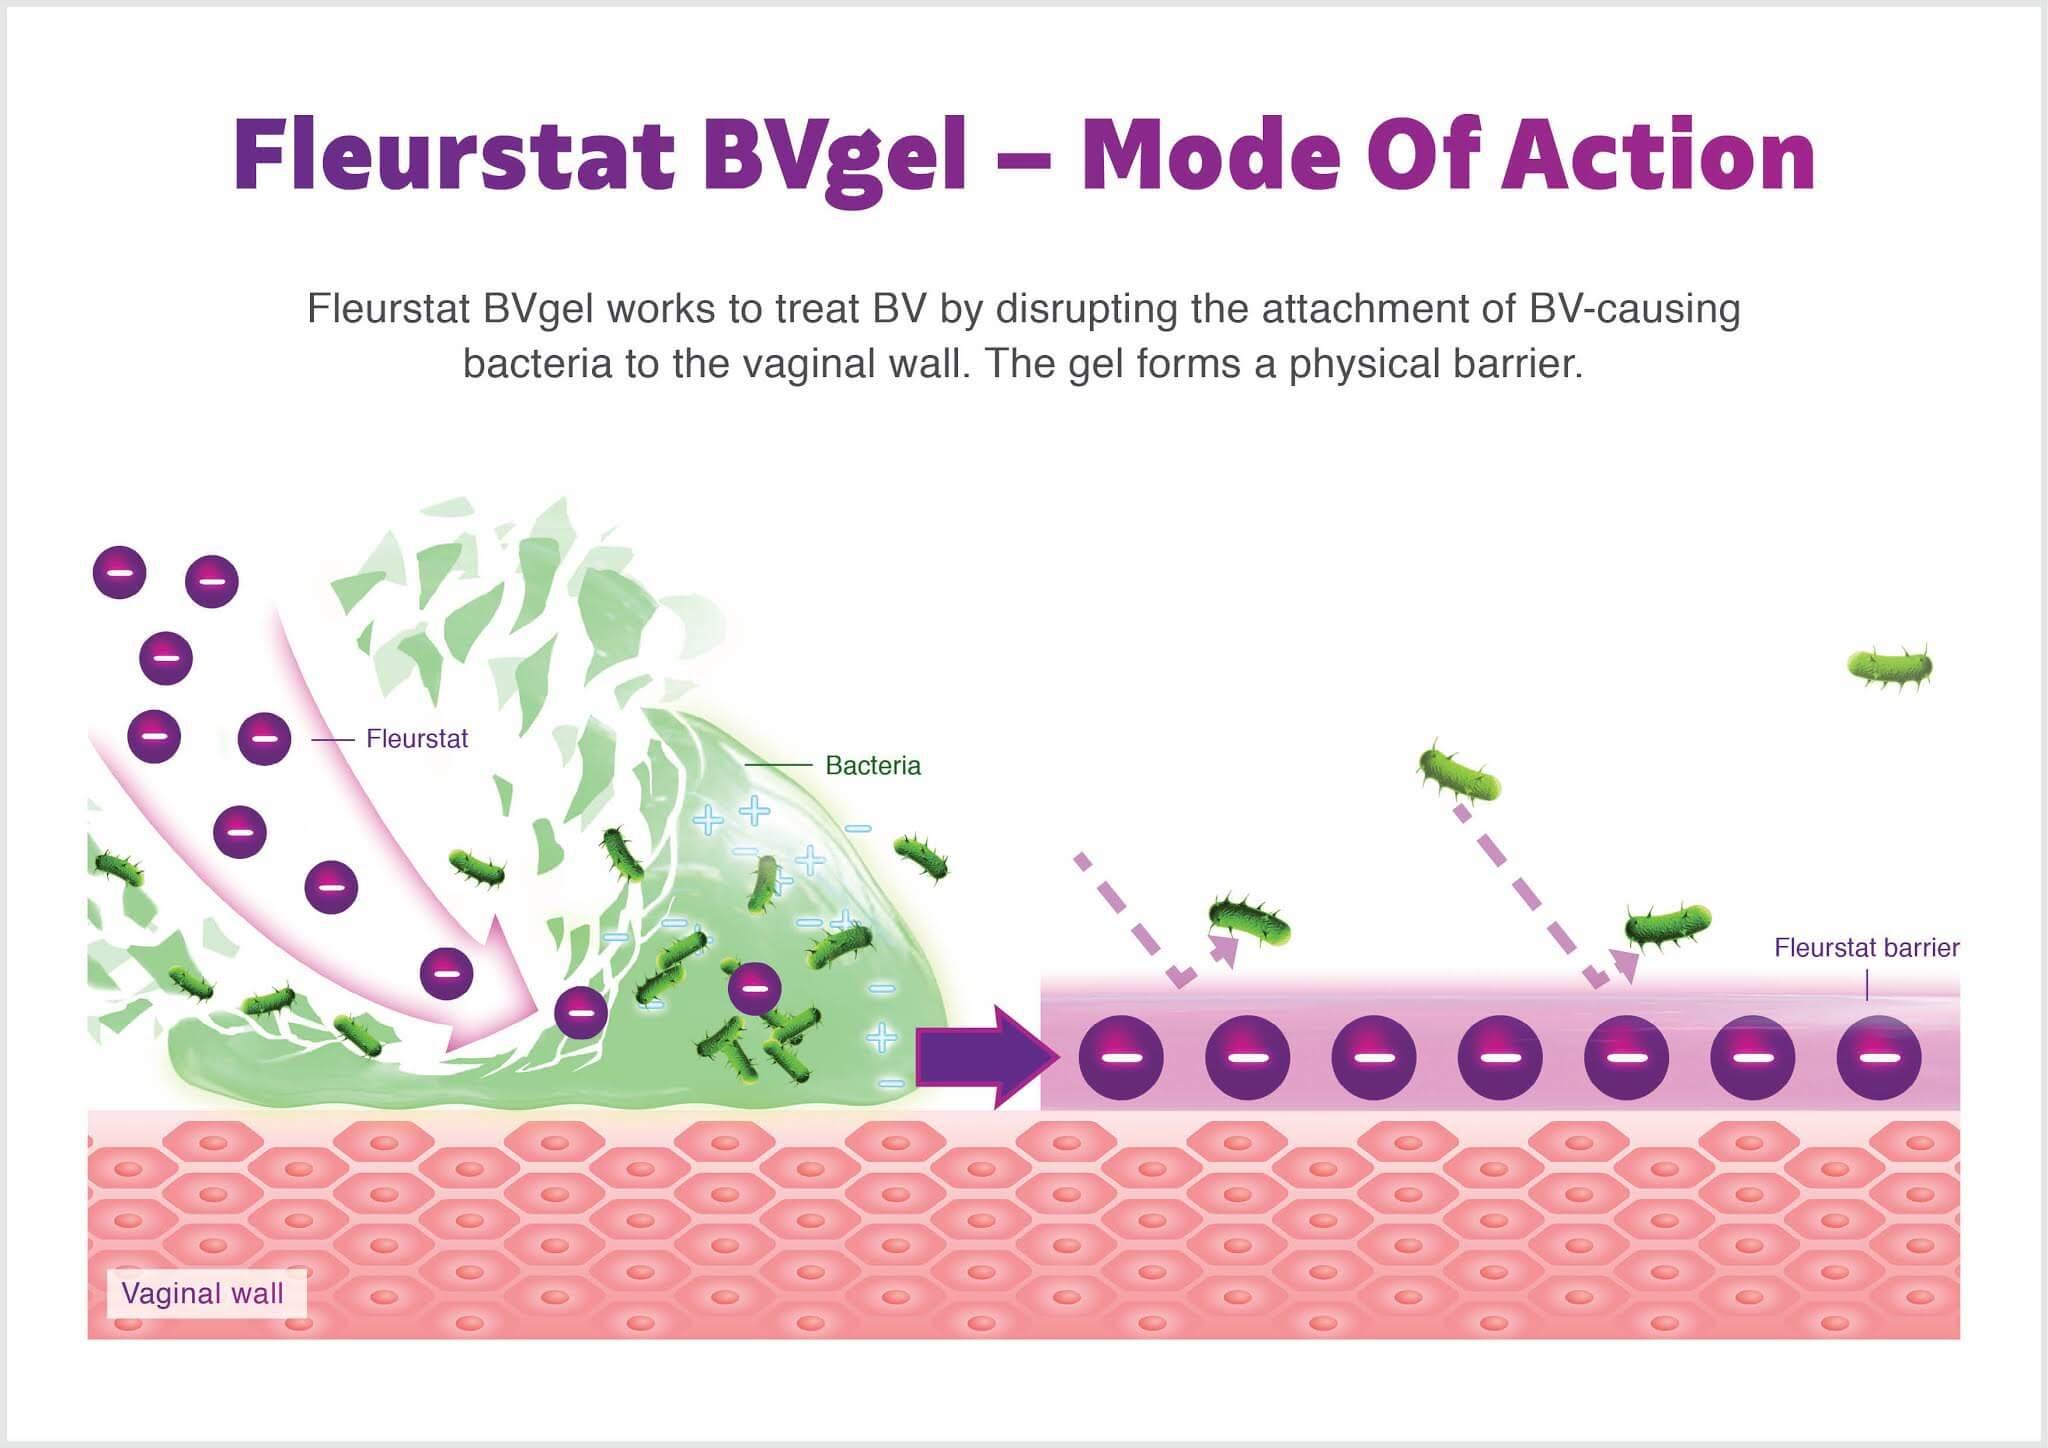 Fleurstat BVGel - Mode Of Action